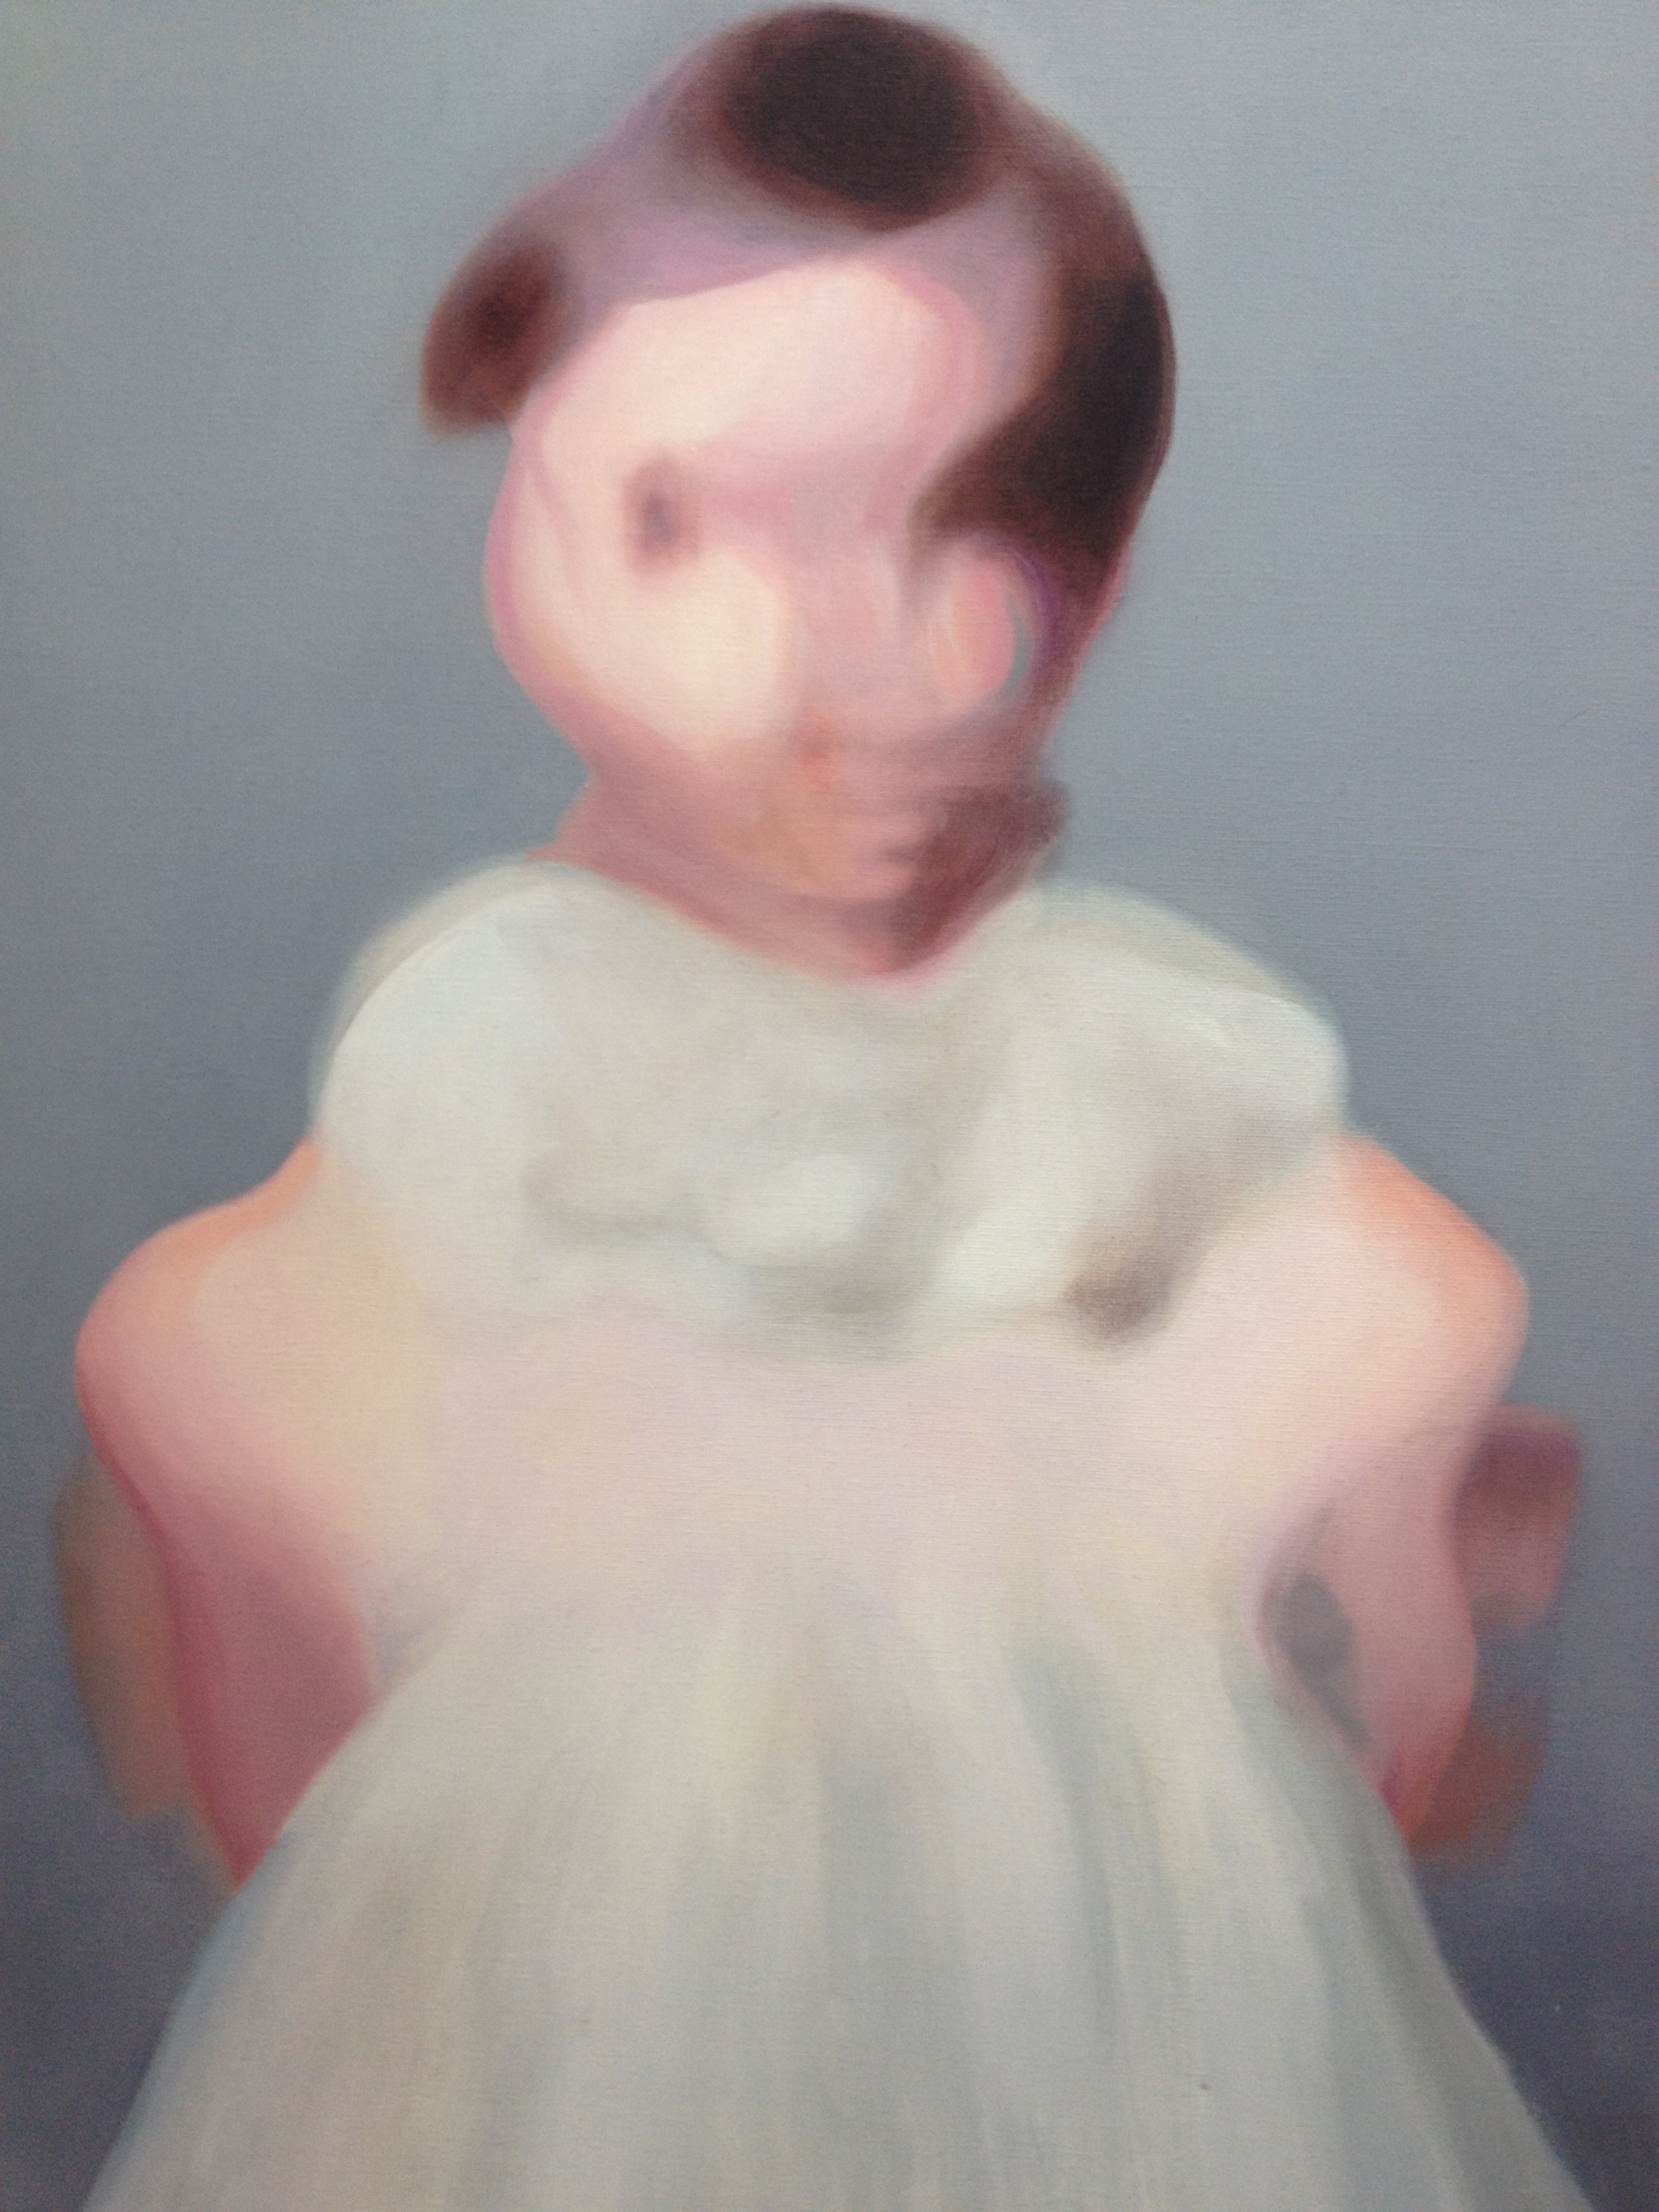 01.The Dress_Oil on canvas_2012_18x24,Nissenbaum.JPG